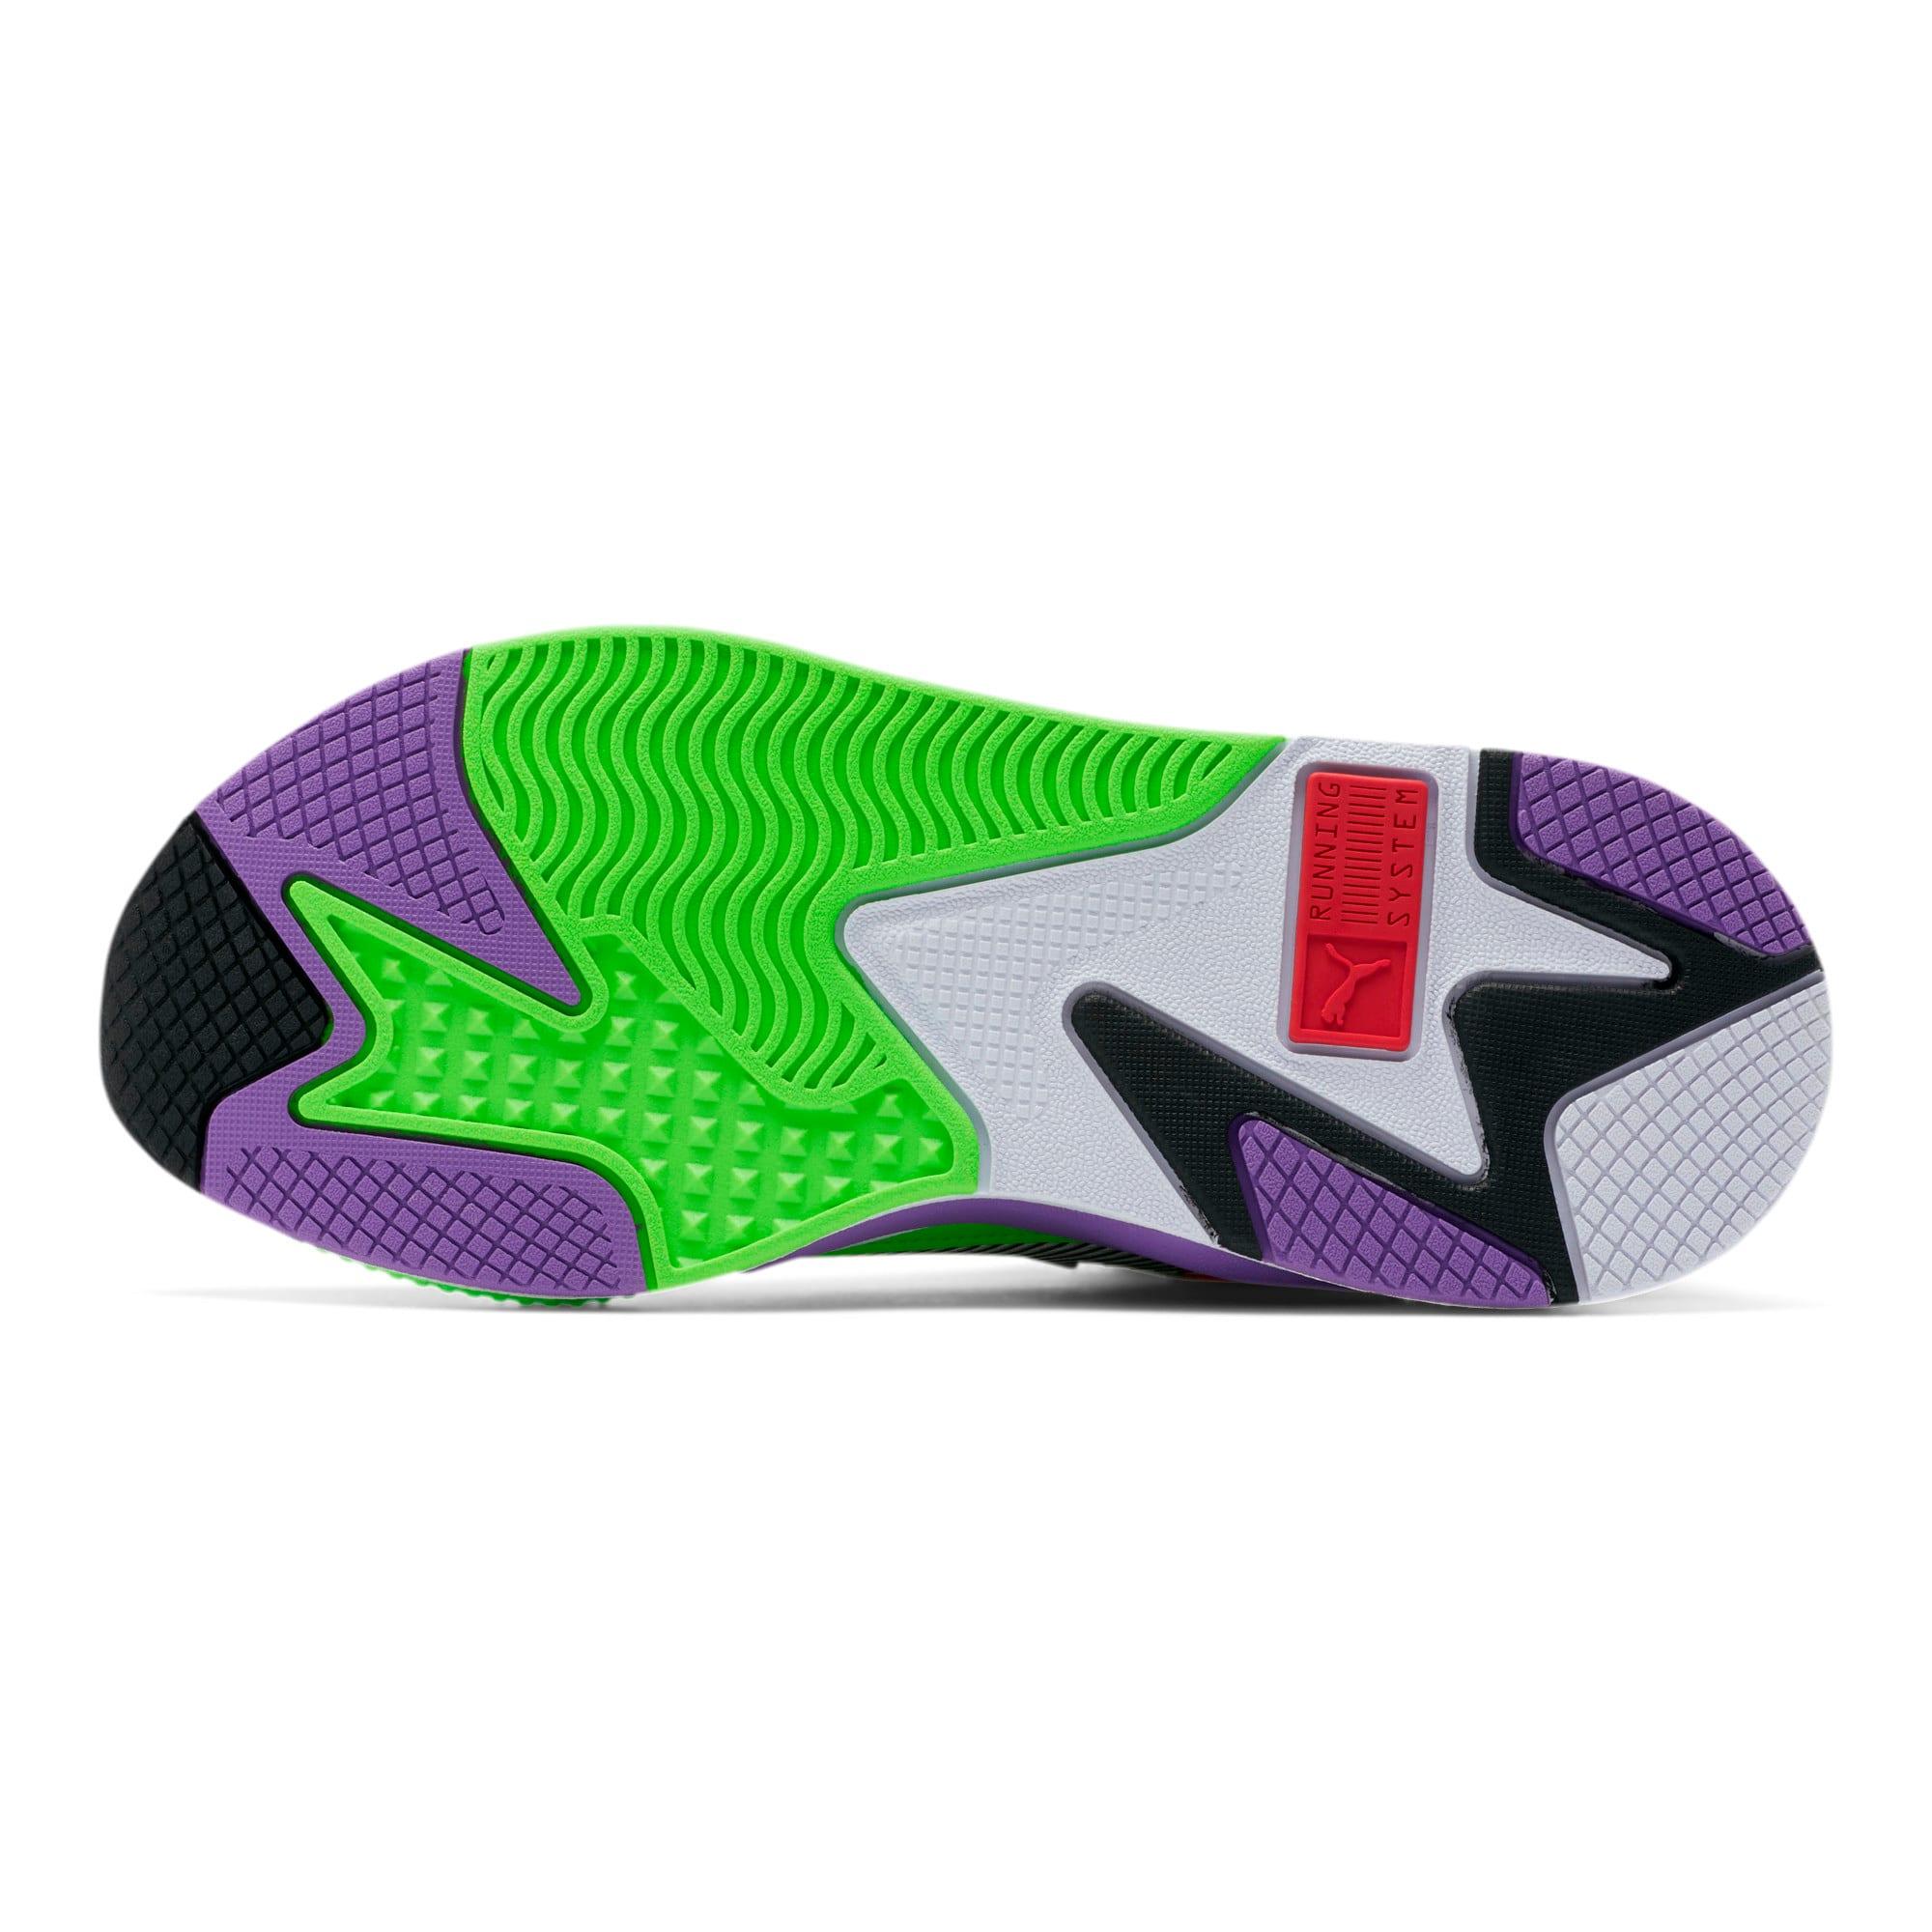 Thumbnail 4 of RS-X Bold Sneakers, PWhite-Gr Gecko-Royal Lilac, medium